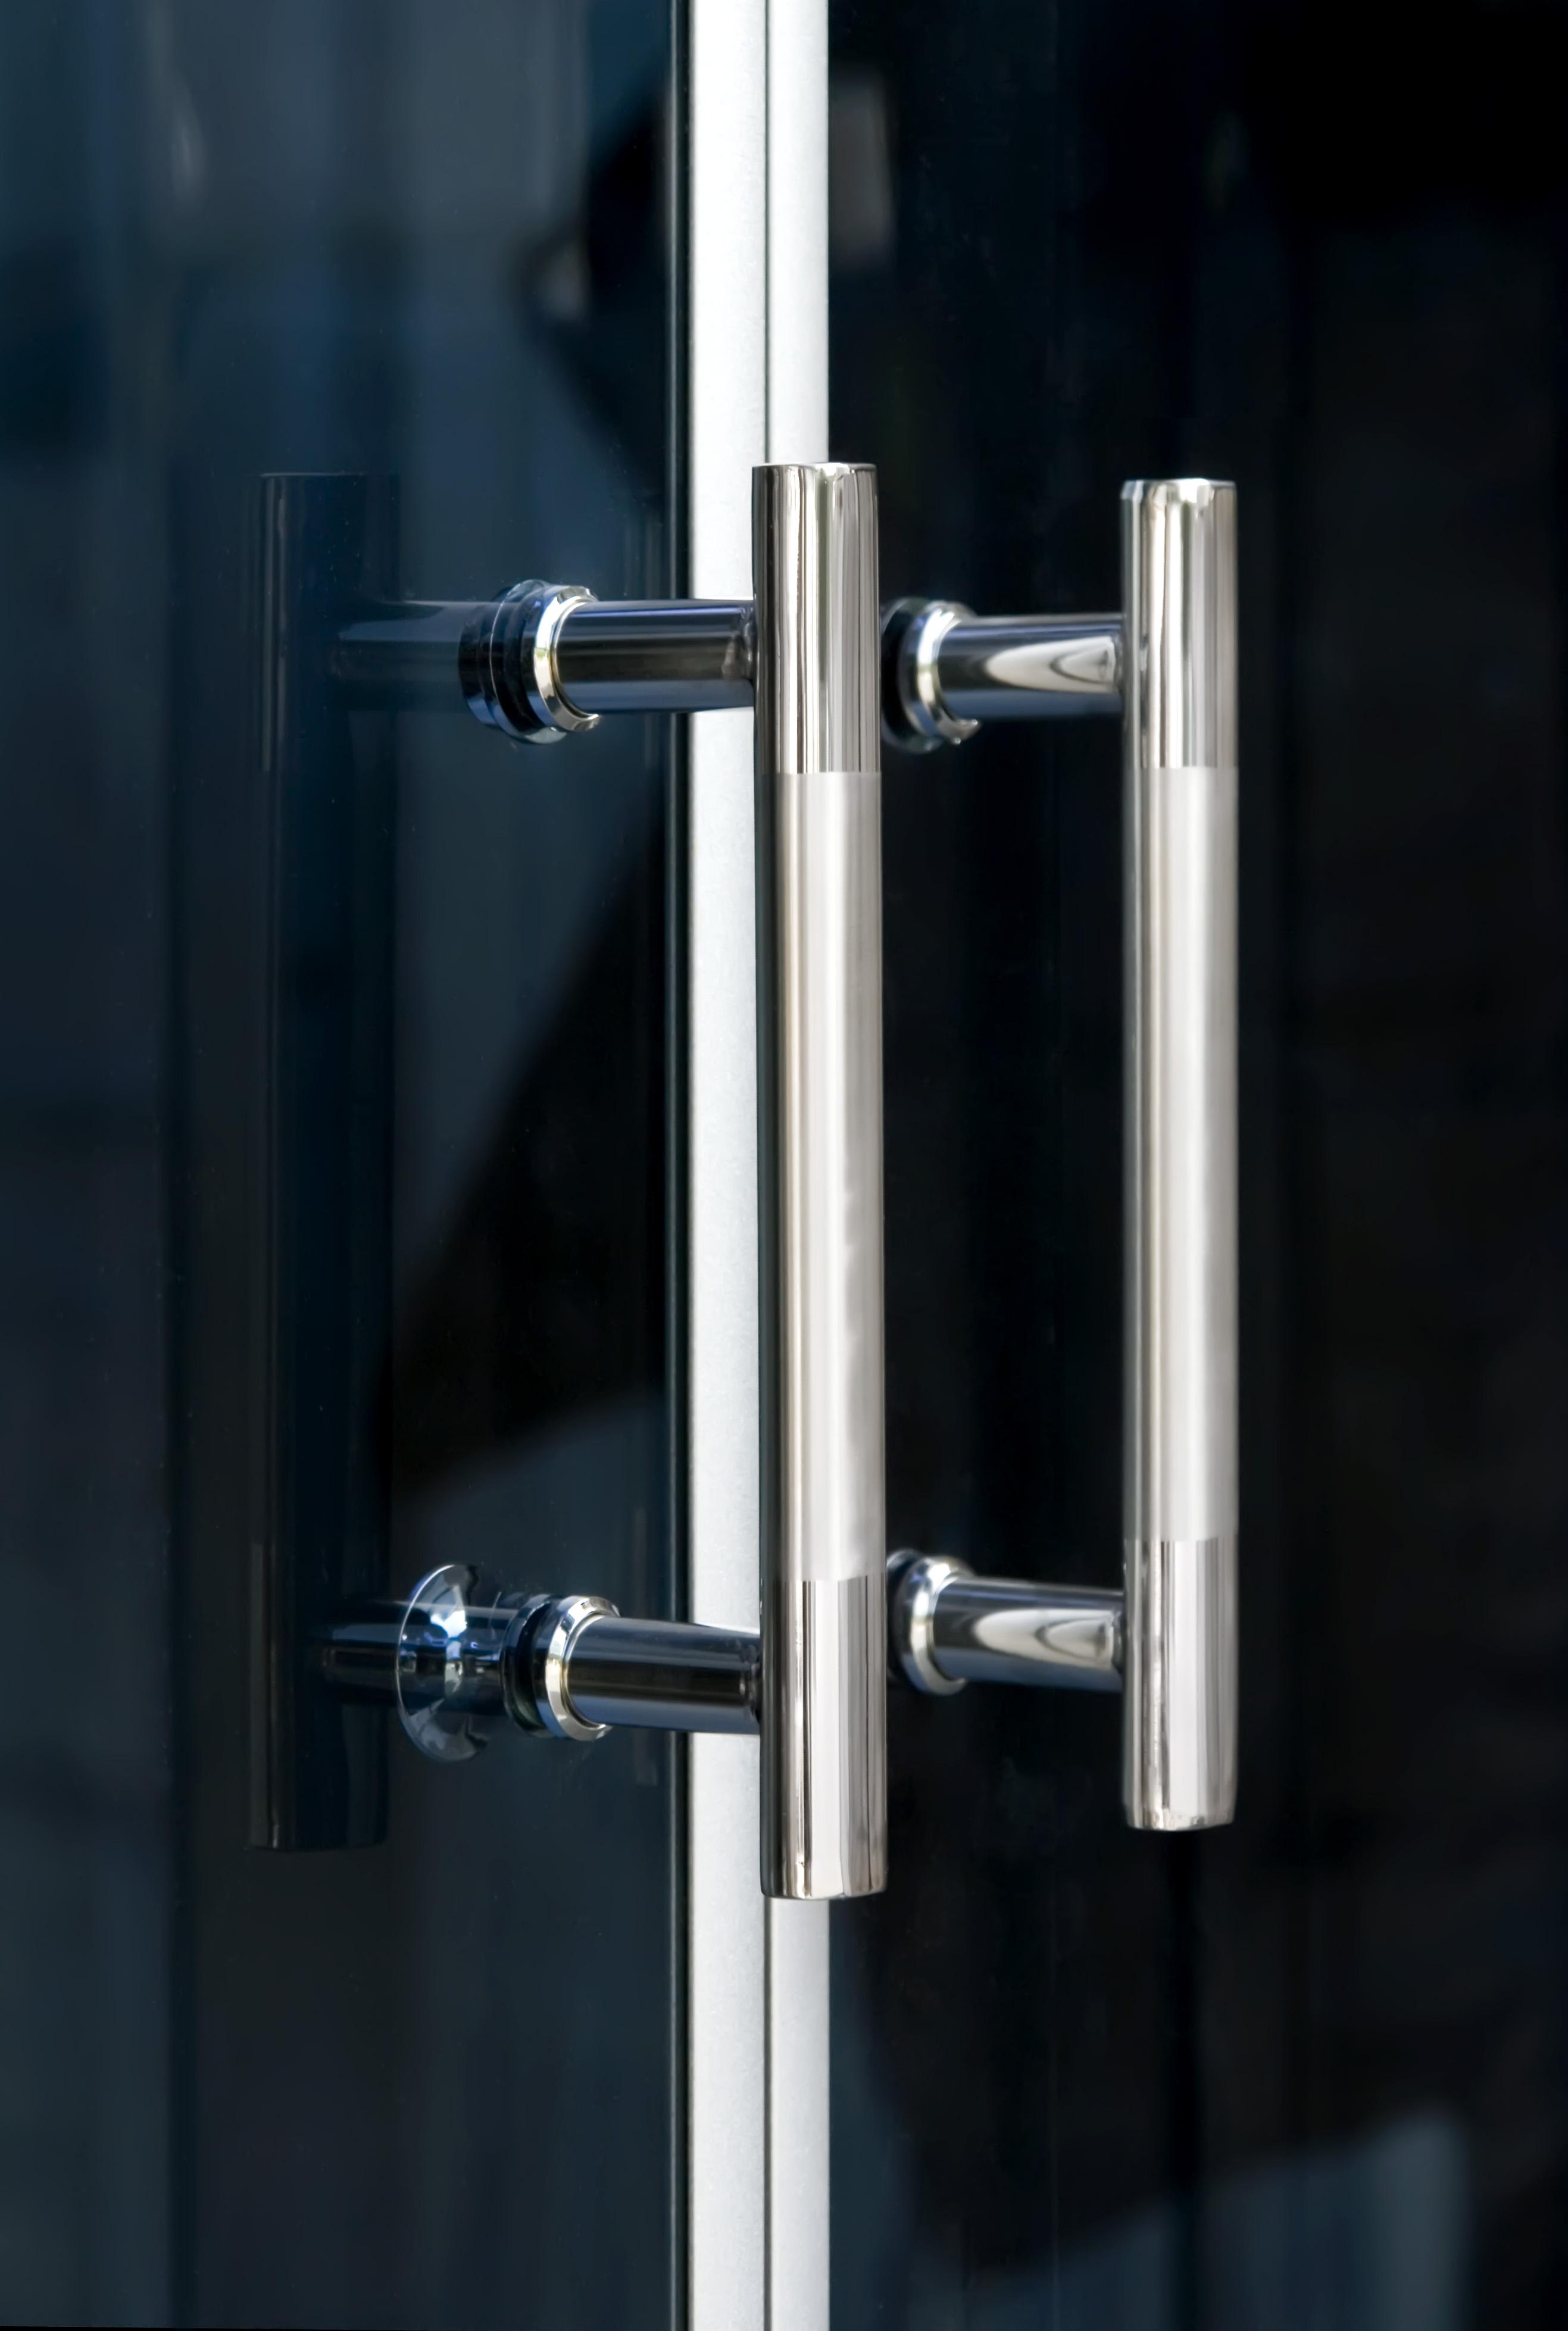 duschkabine badewanne regendusche dusche duschwand. Black Bedroom Furniture Sets. Home Design Ideas